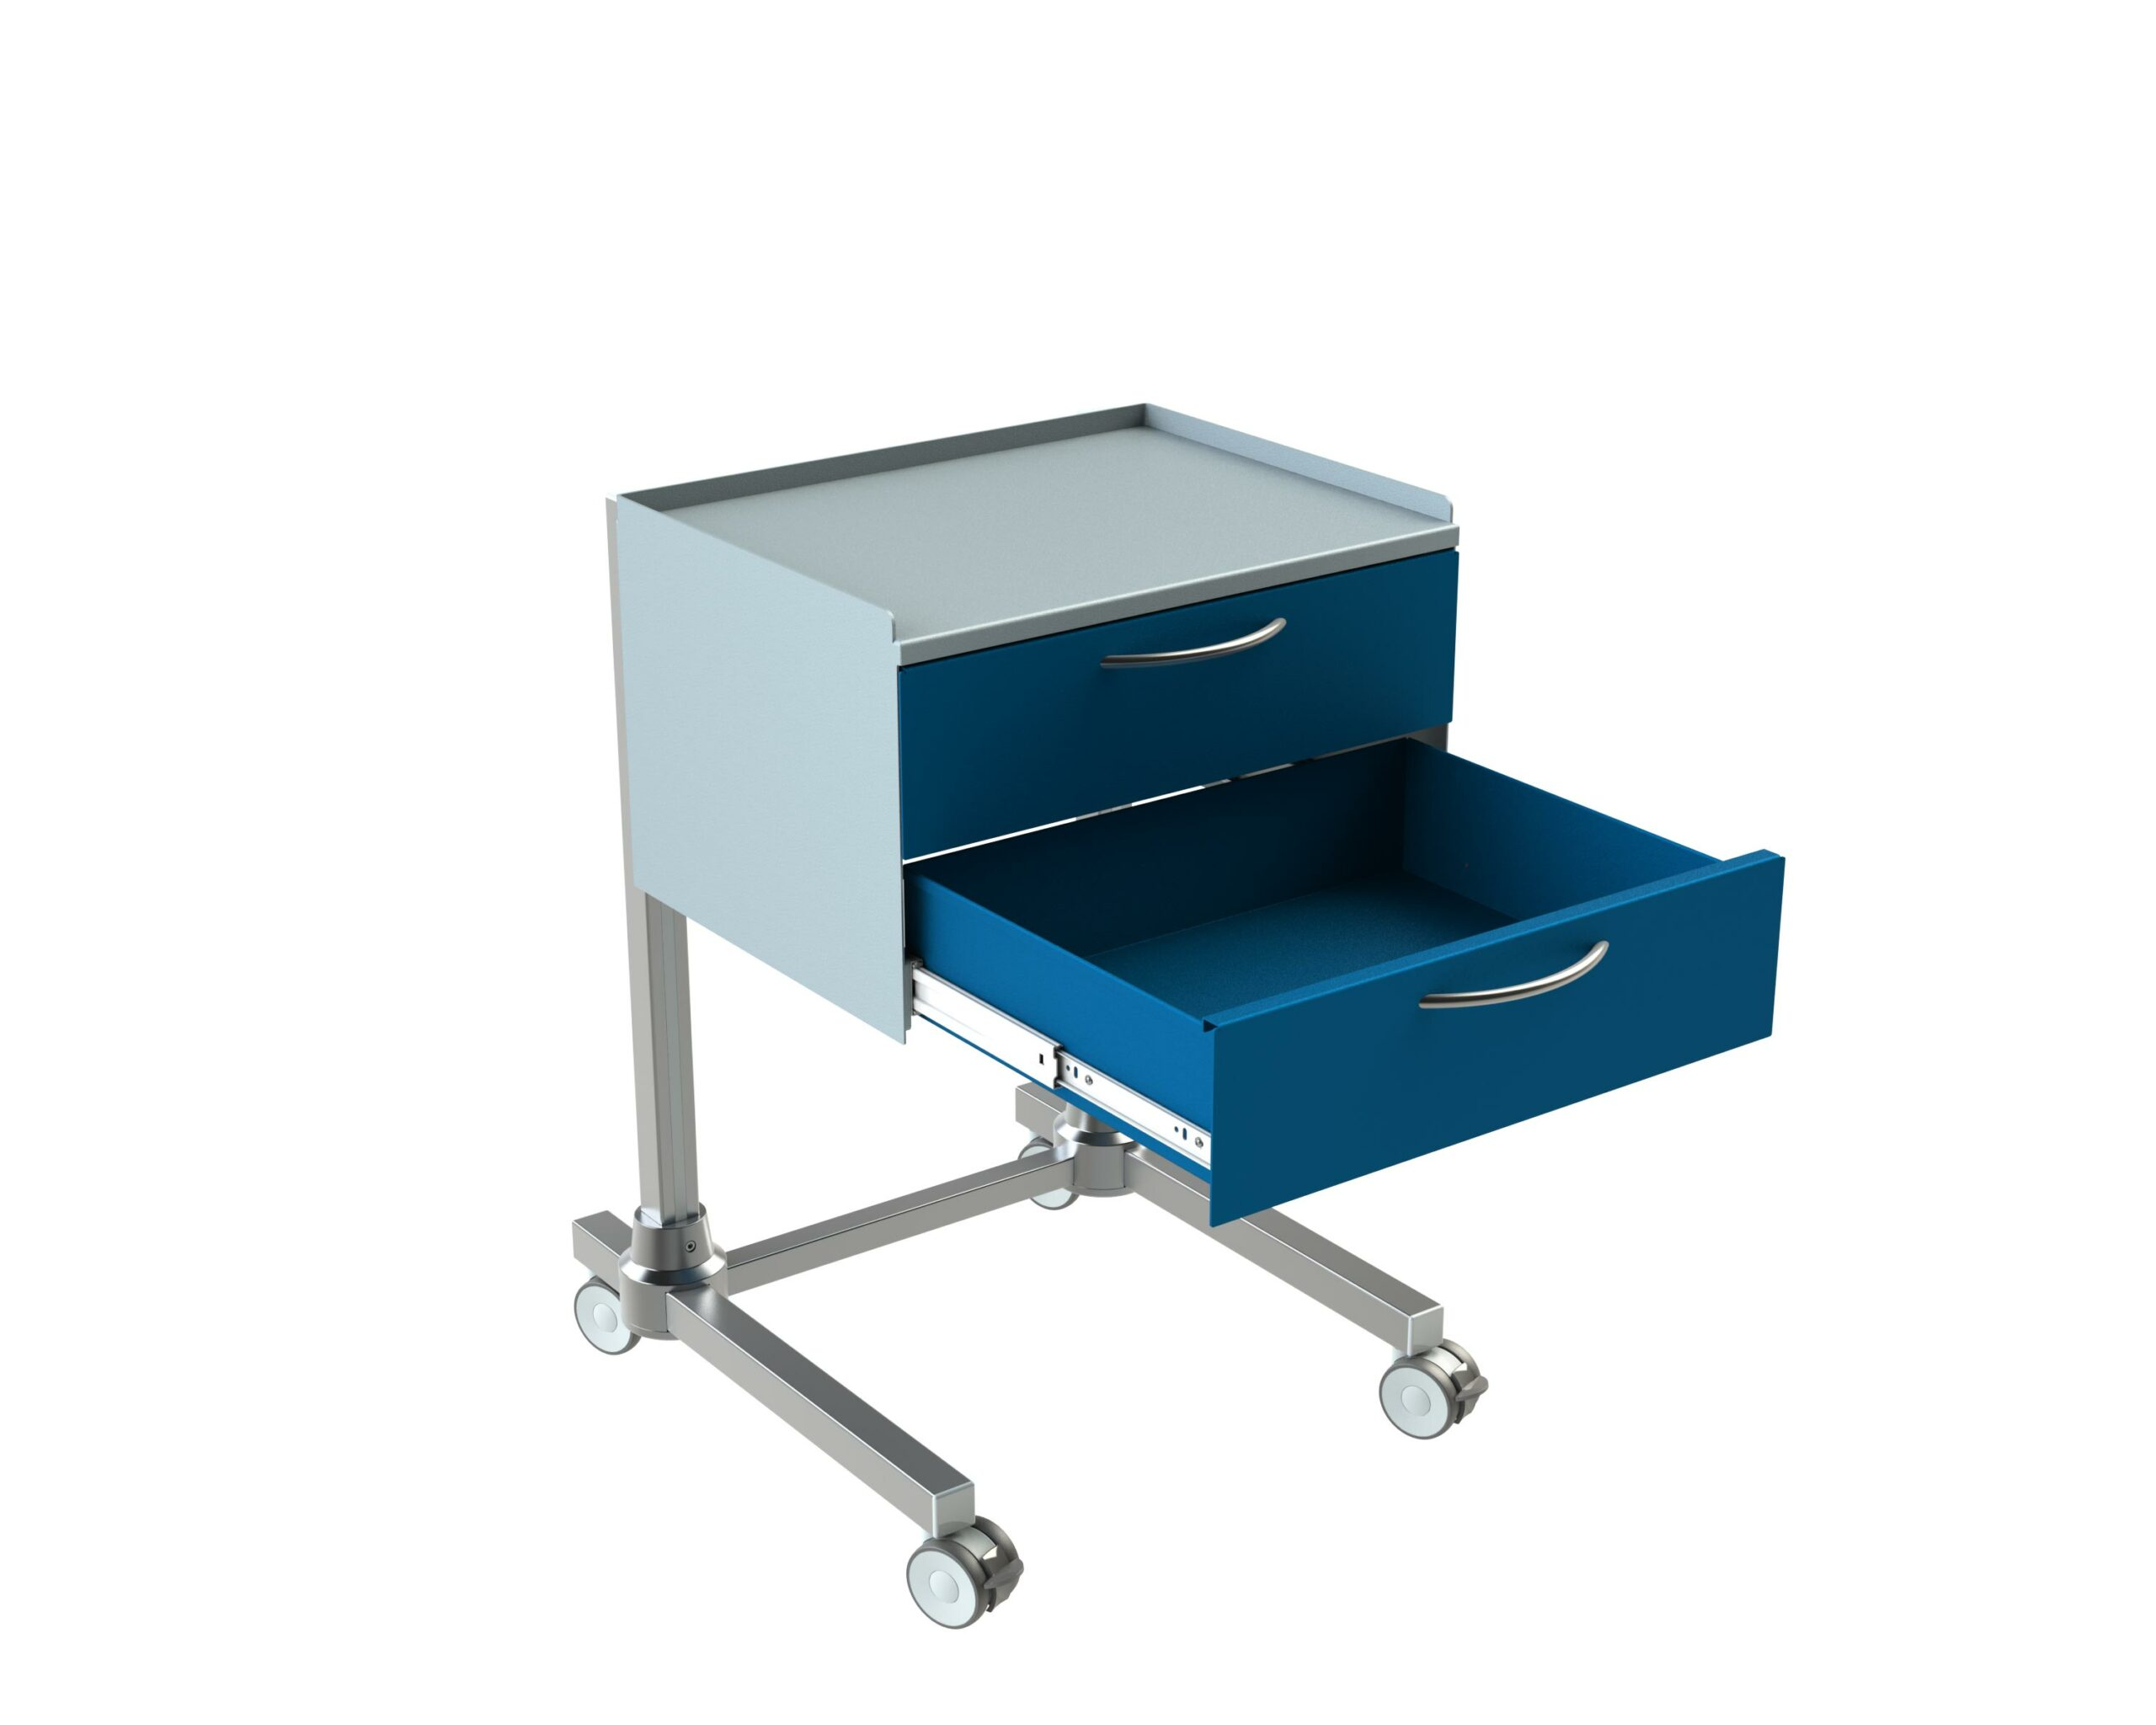 Hygienestation-Henry-2-Schubladen-Arbeitsplatte-Reling